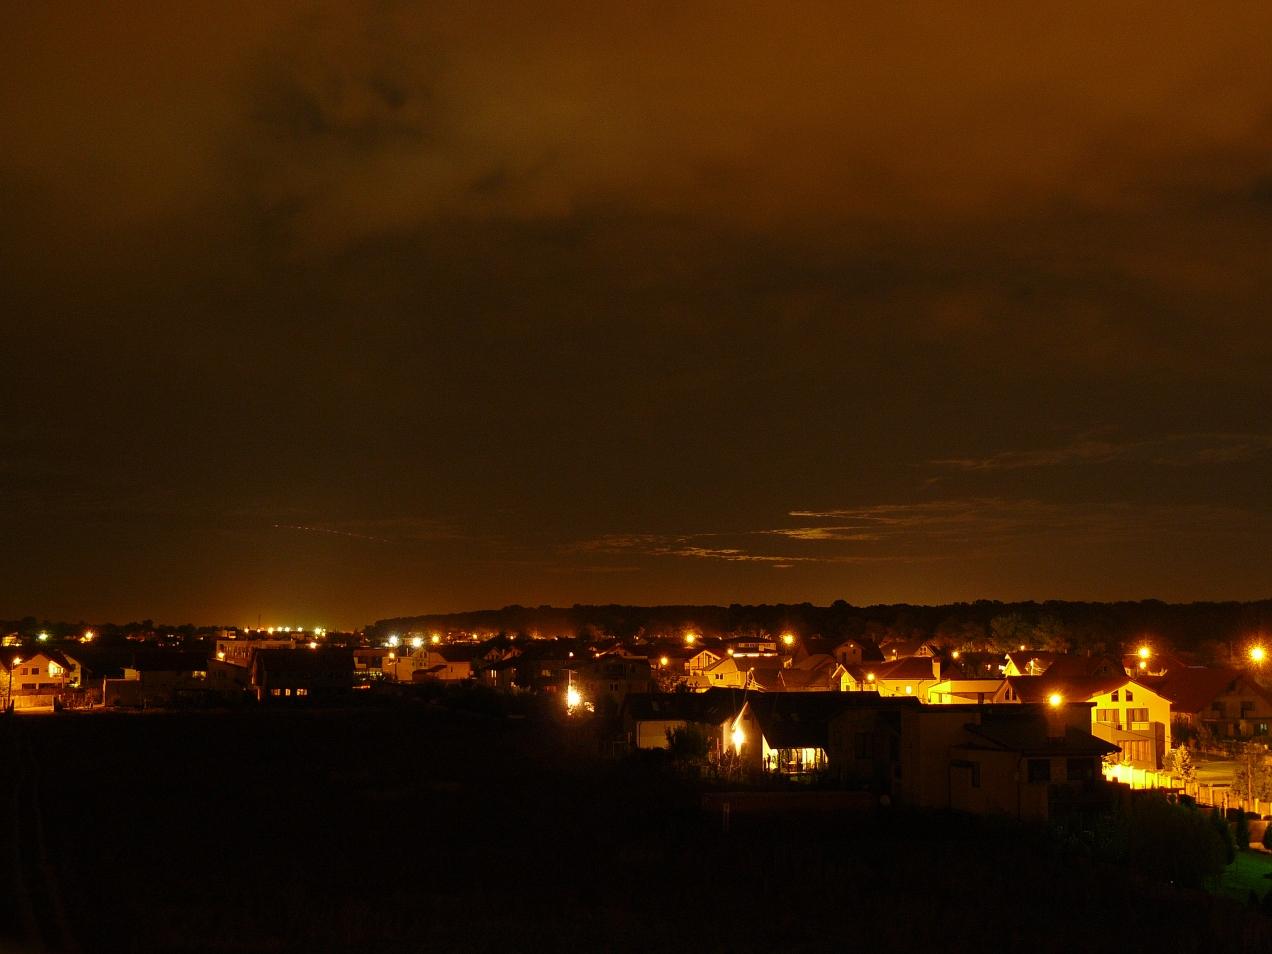 Foto peisaj urban in noapte innorata